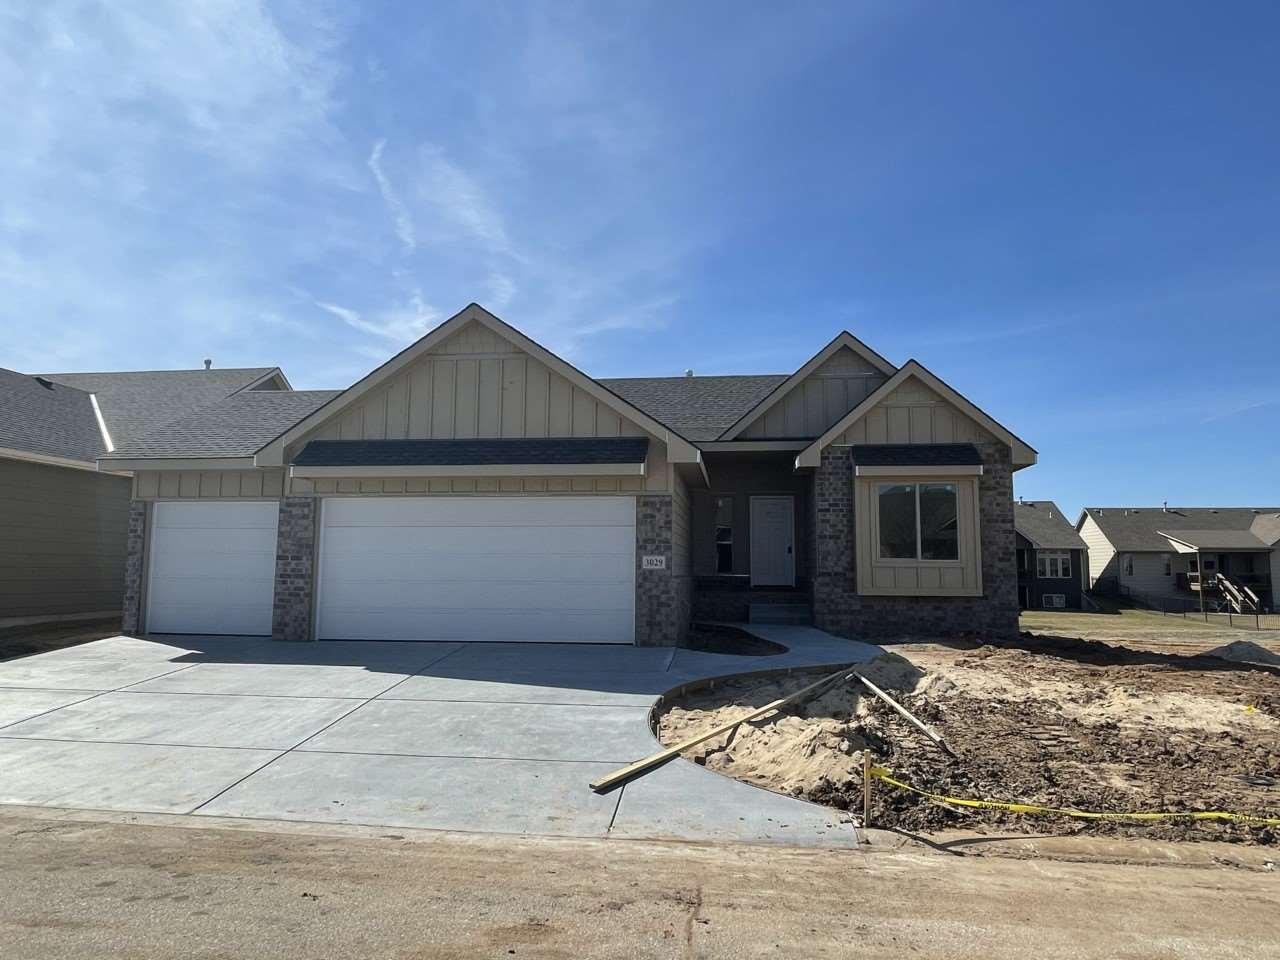 3029 N Shefford St, Wichita, KS, 67205